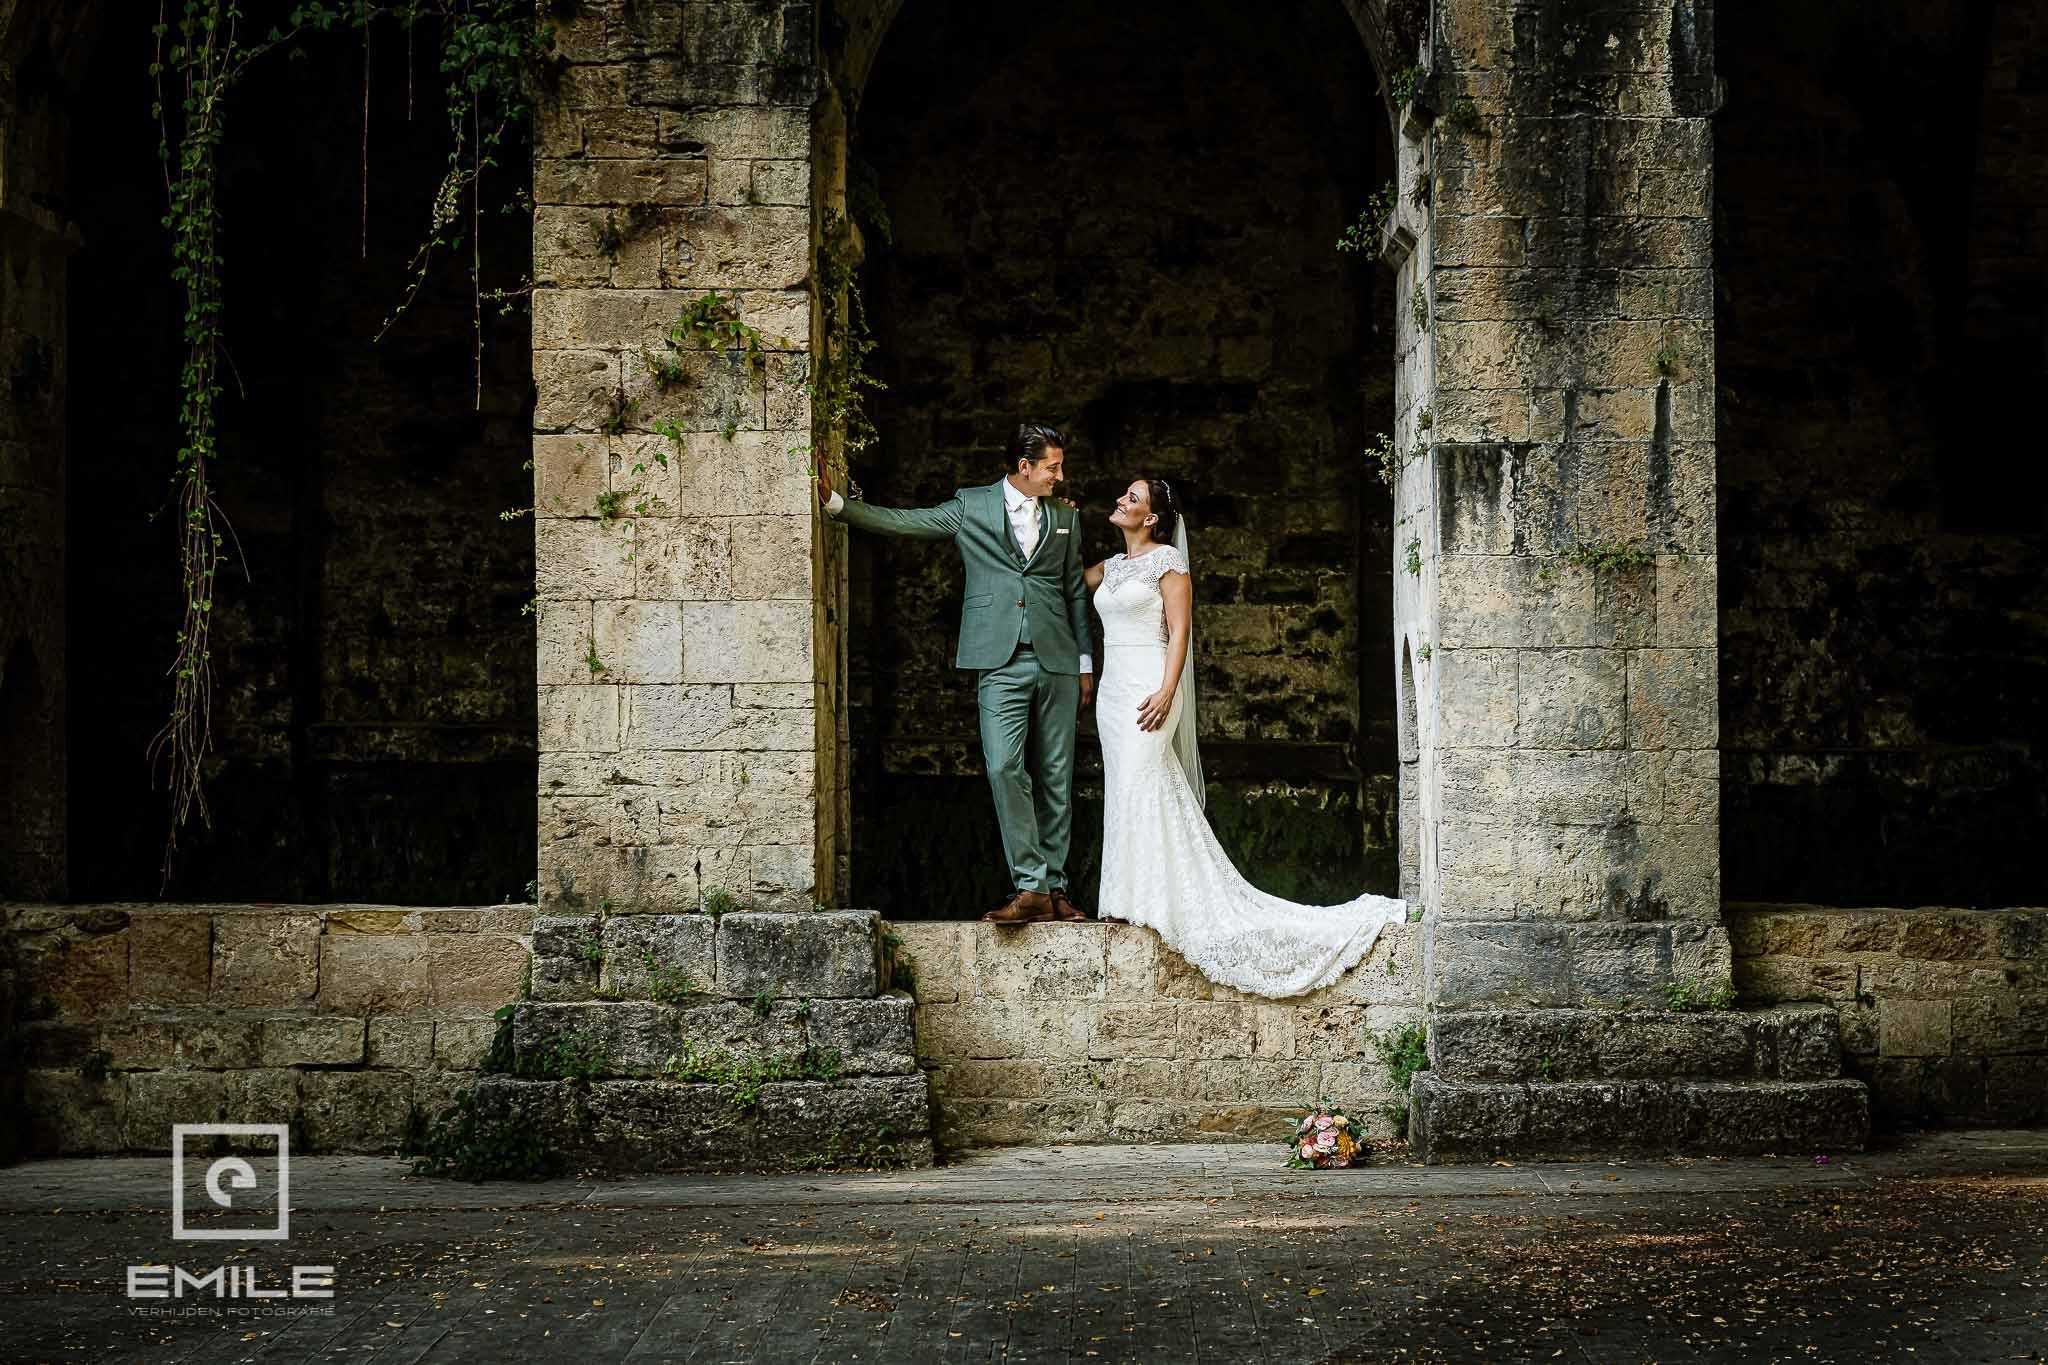 Bruidspaar bij de ruine van Poggibonsi - Destination wedding San Gimignano - Toscane Italie - Iris en Job